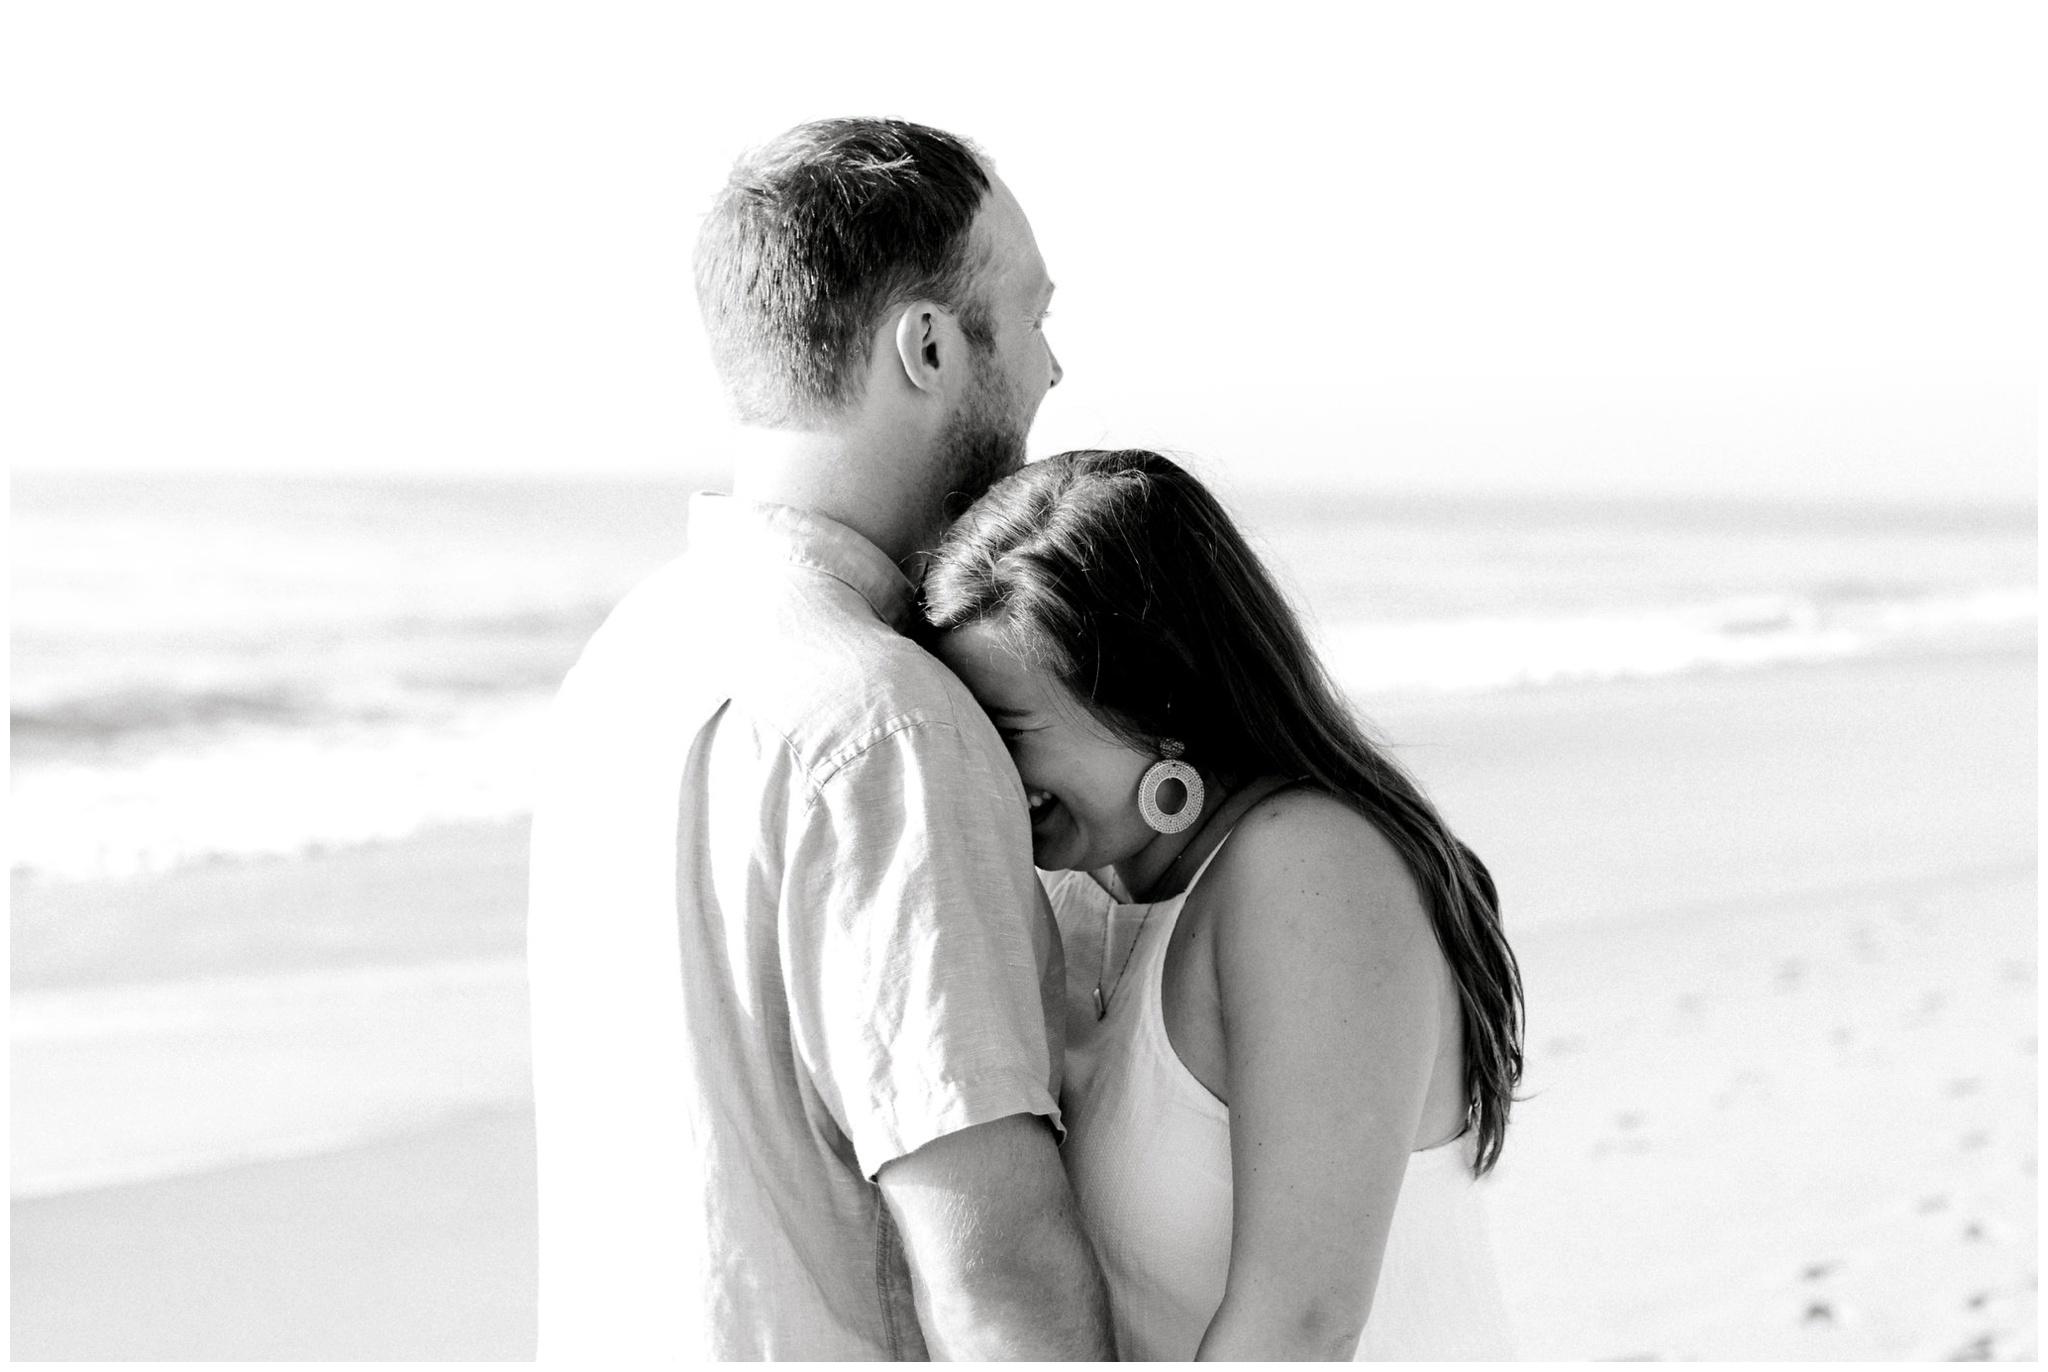 Bethany Beach Proposal, Bethany beach engagement, bethany beach photographer, delaware wedding photographer, bethany beach wedding photographer, bethany beach engagement photographer